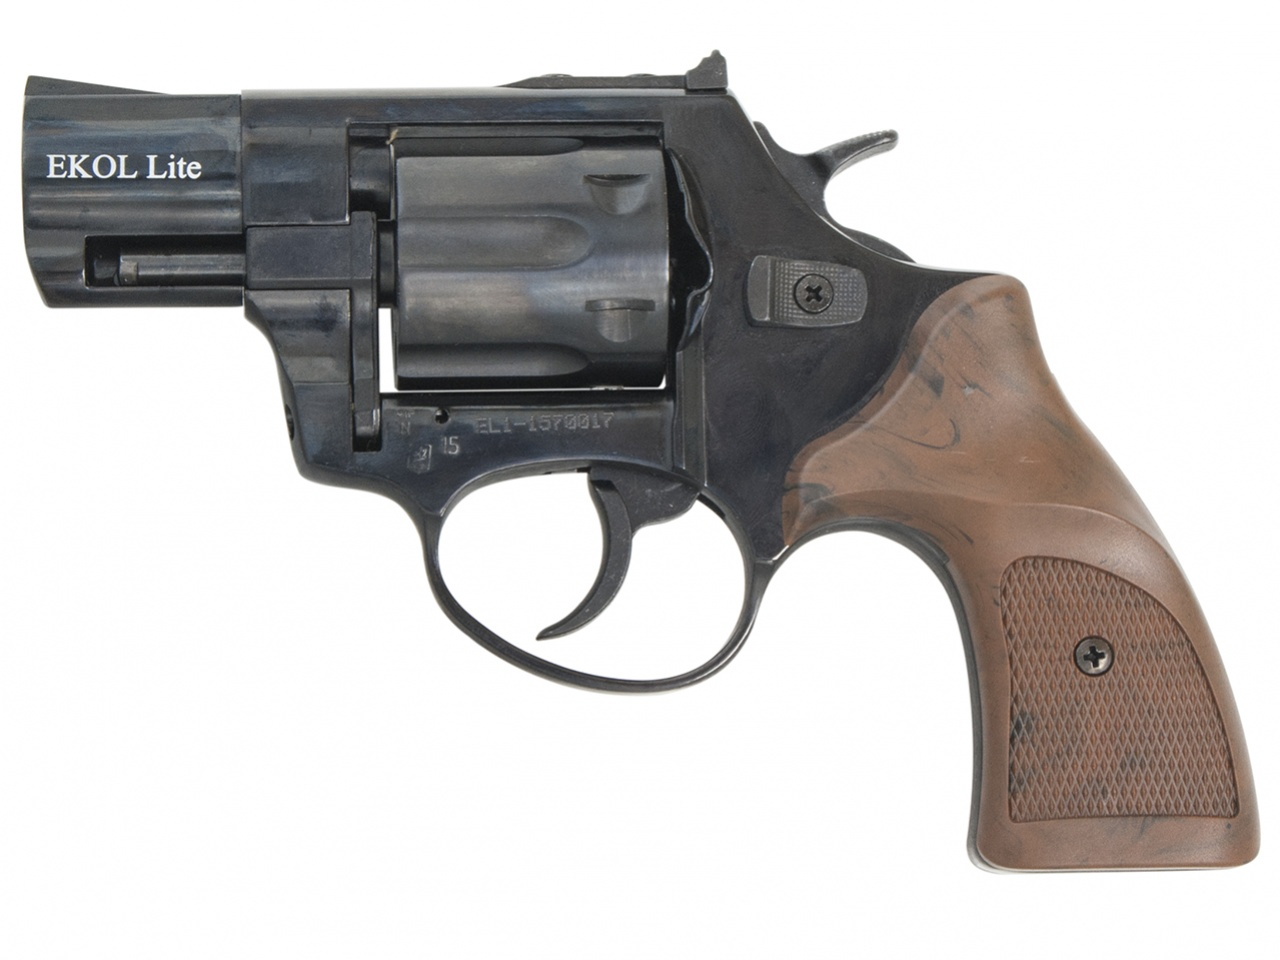 Rewolwer gazowy Ekol Viper Lite czarny kal. 9mm